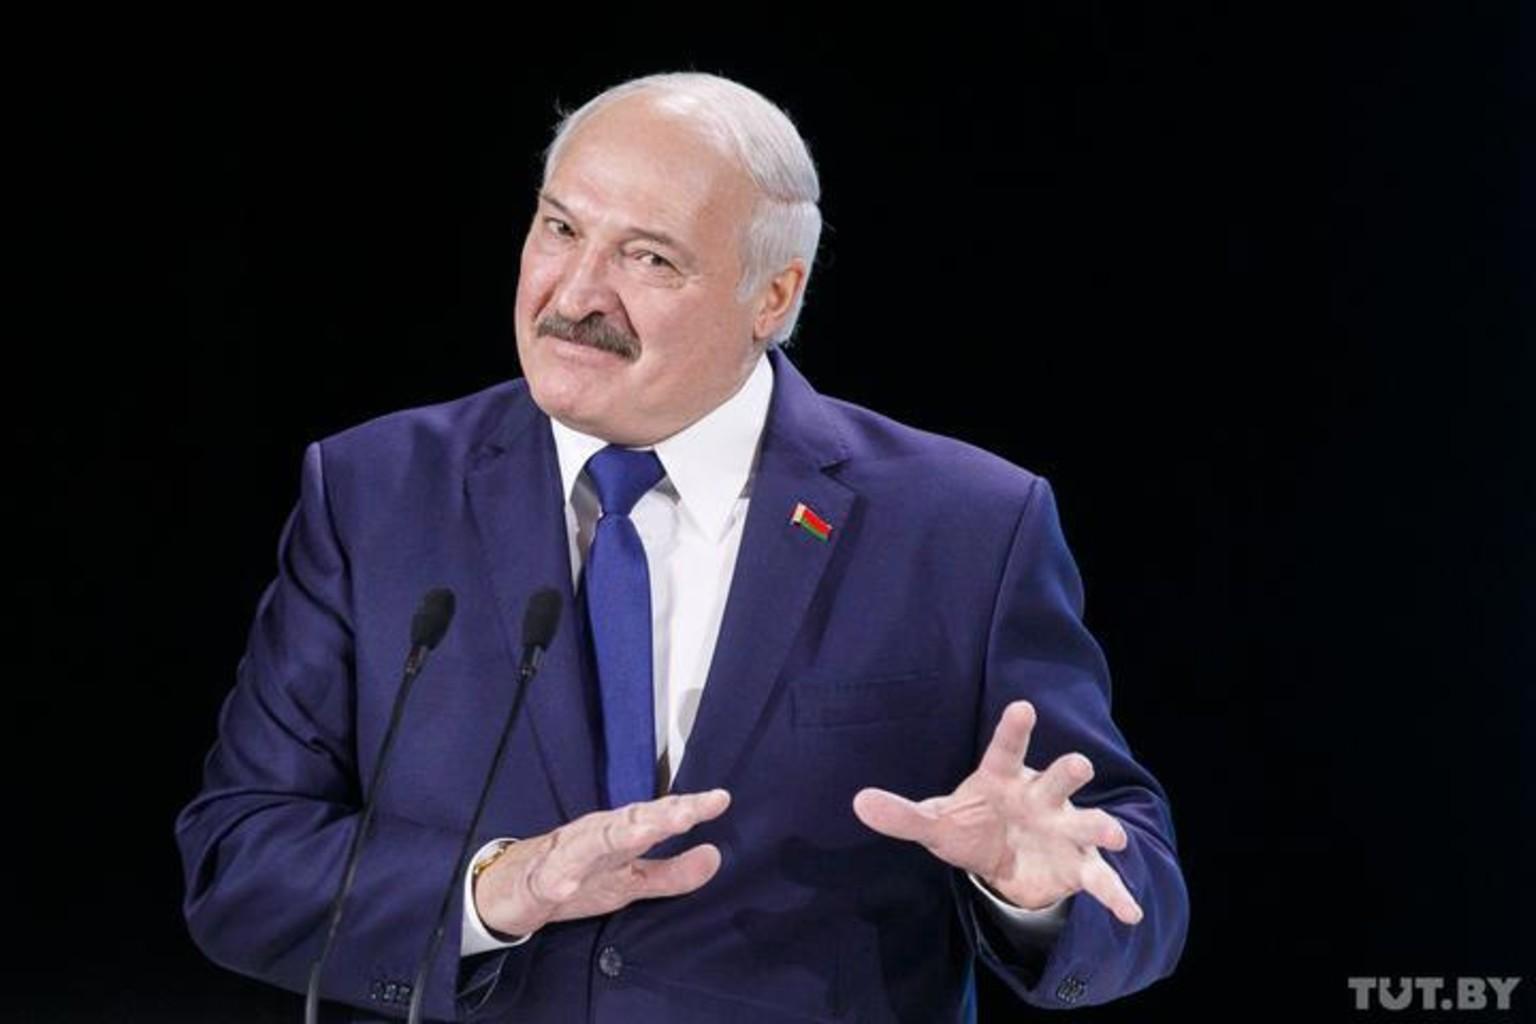 Lukashenko 20191004 shuk tutby phsl 1515